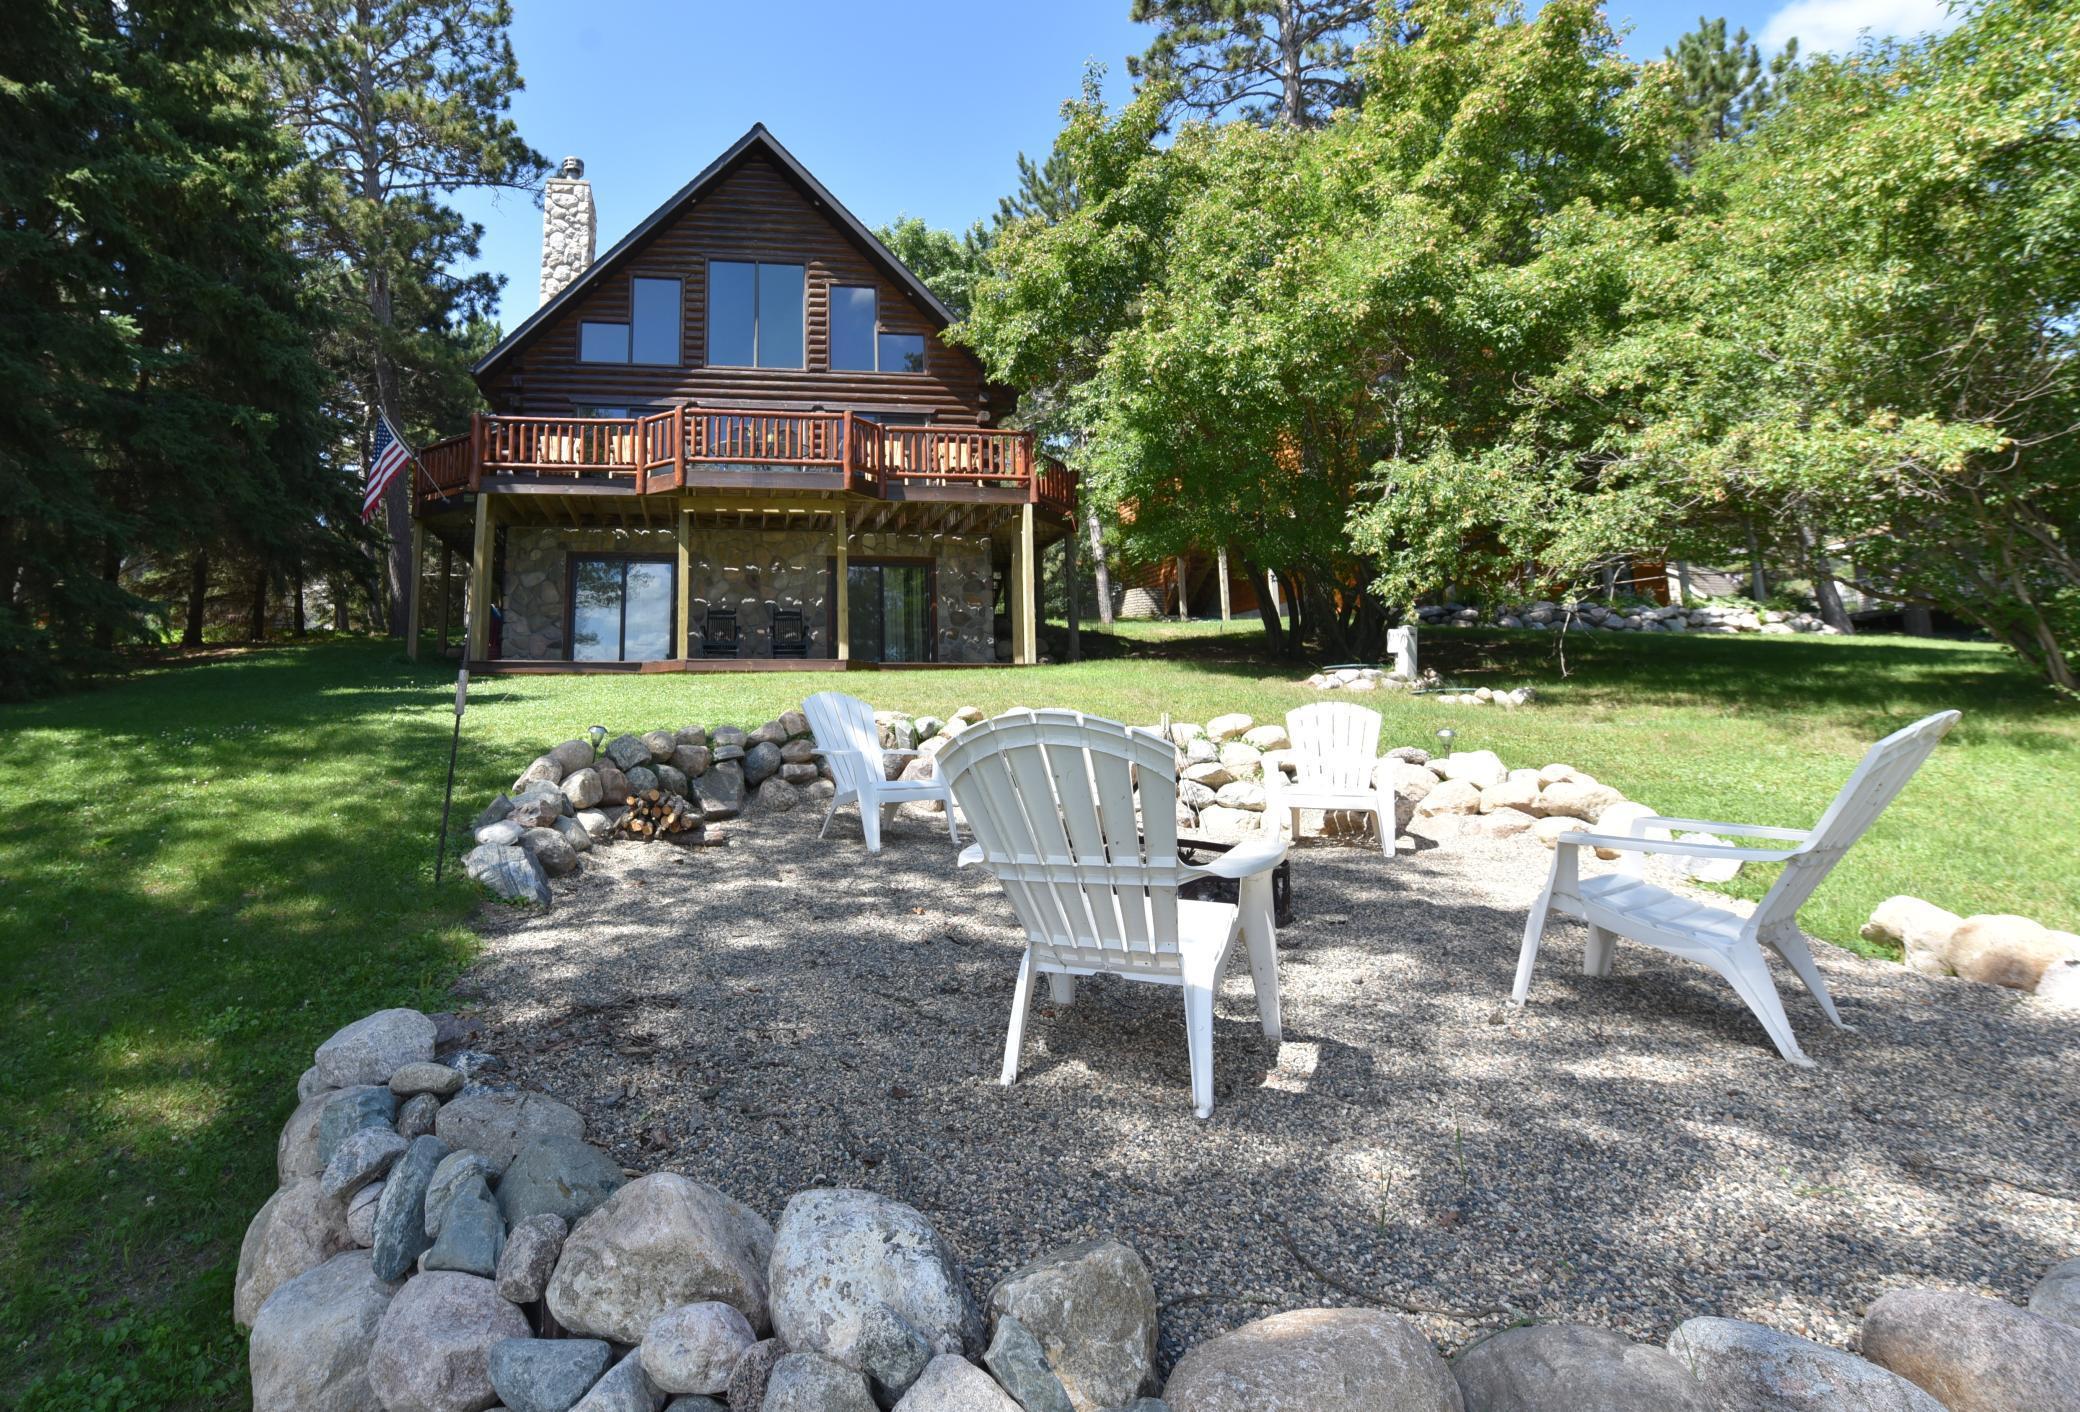 14556 Chippewa Trail Property Photo - Park Rapids, MN real estate listing